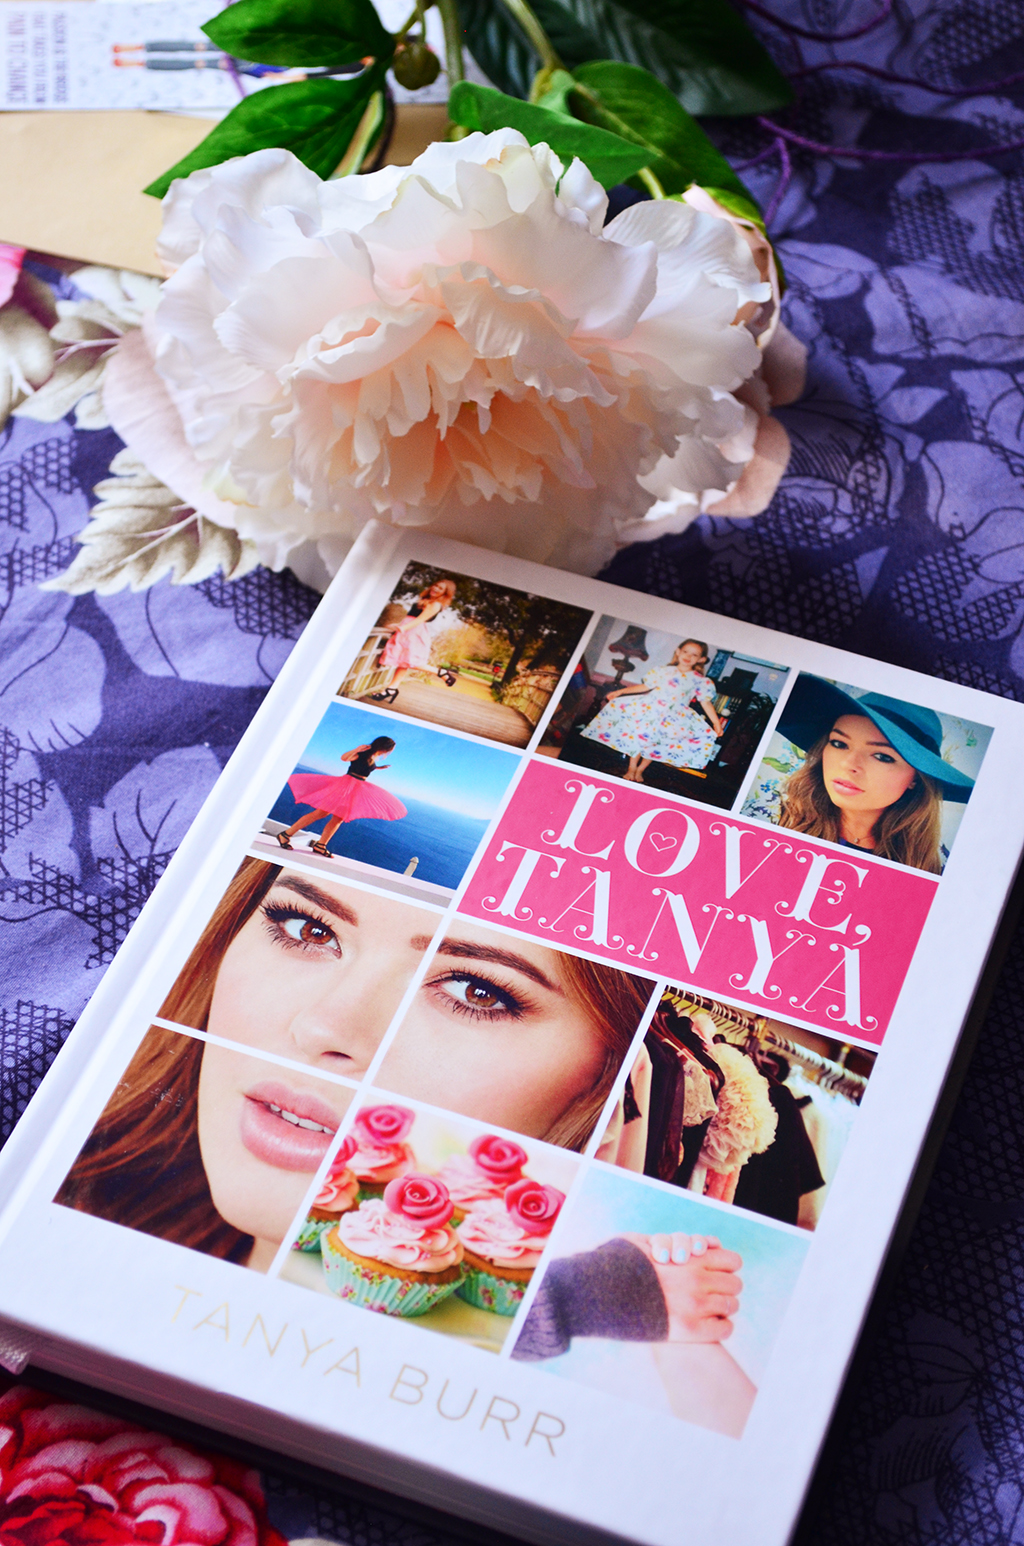 recenzie carte book review love tanya burr